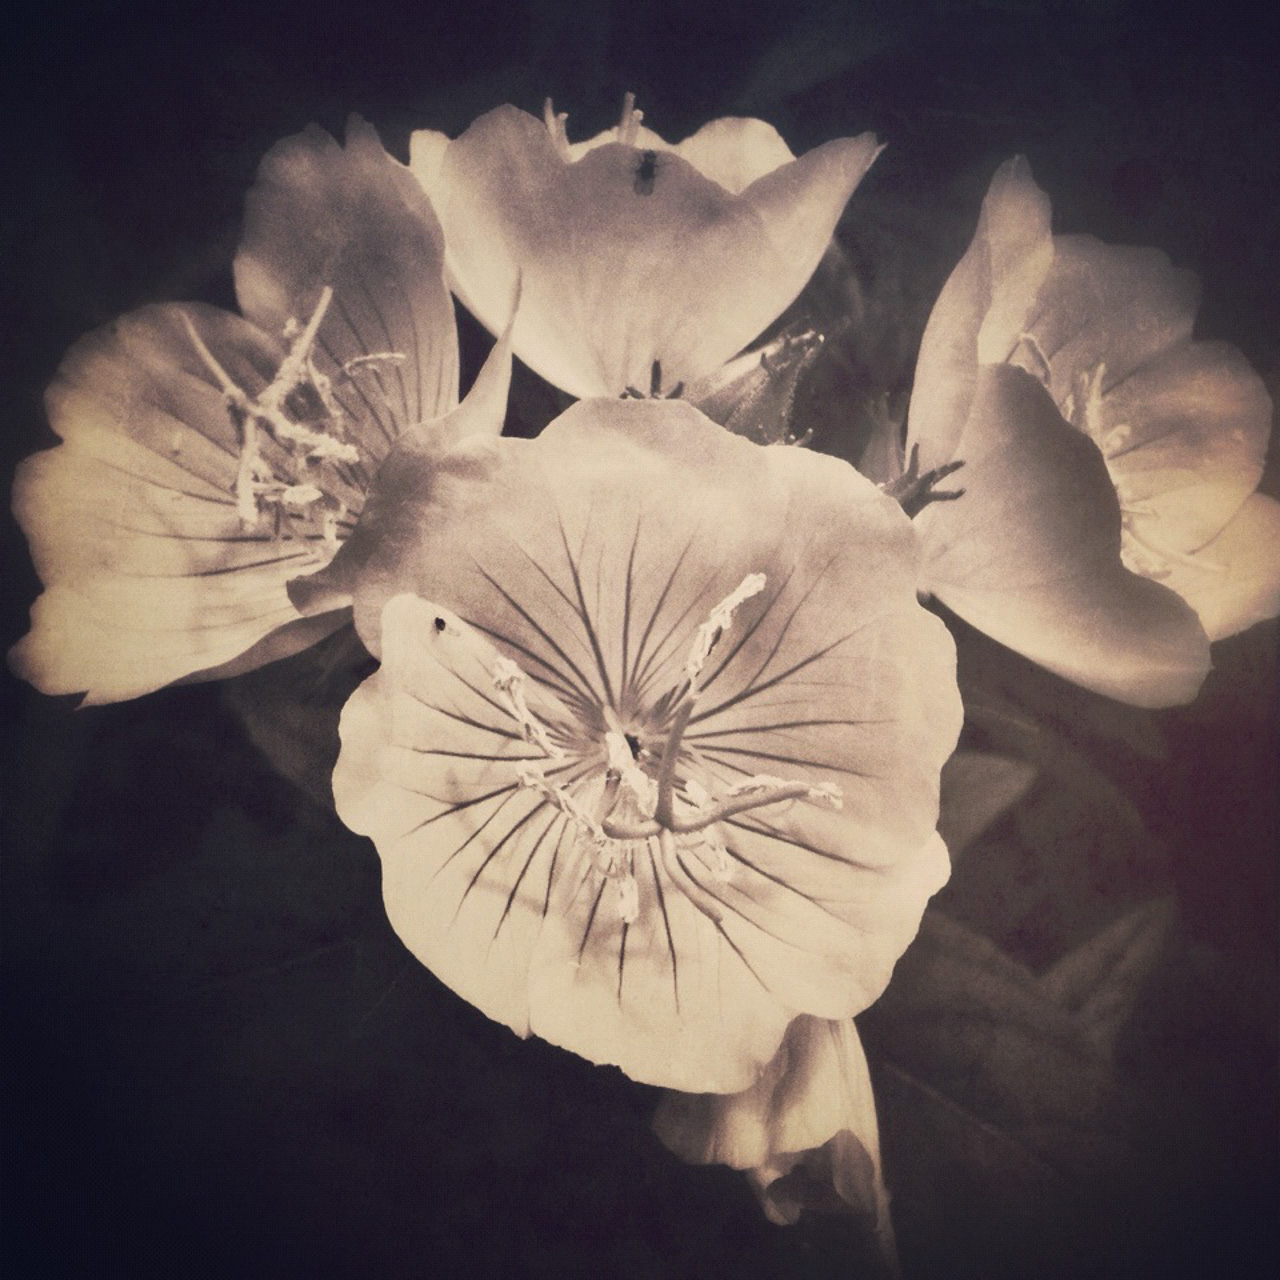 Jen-Kiaba-fine-art-still-life-3240.jpg